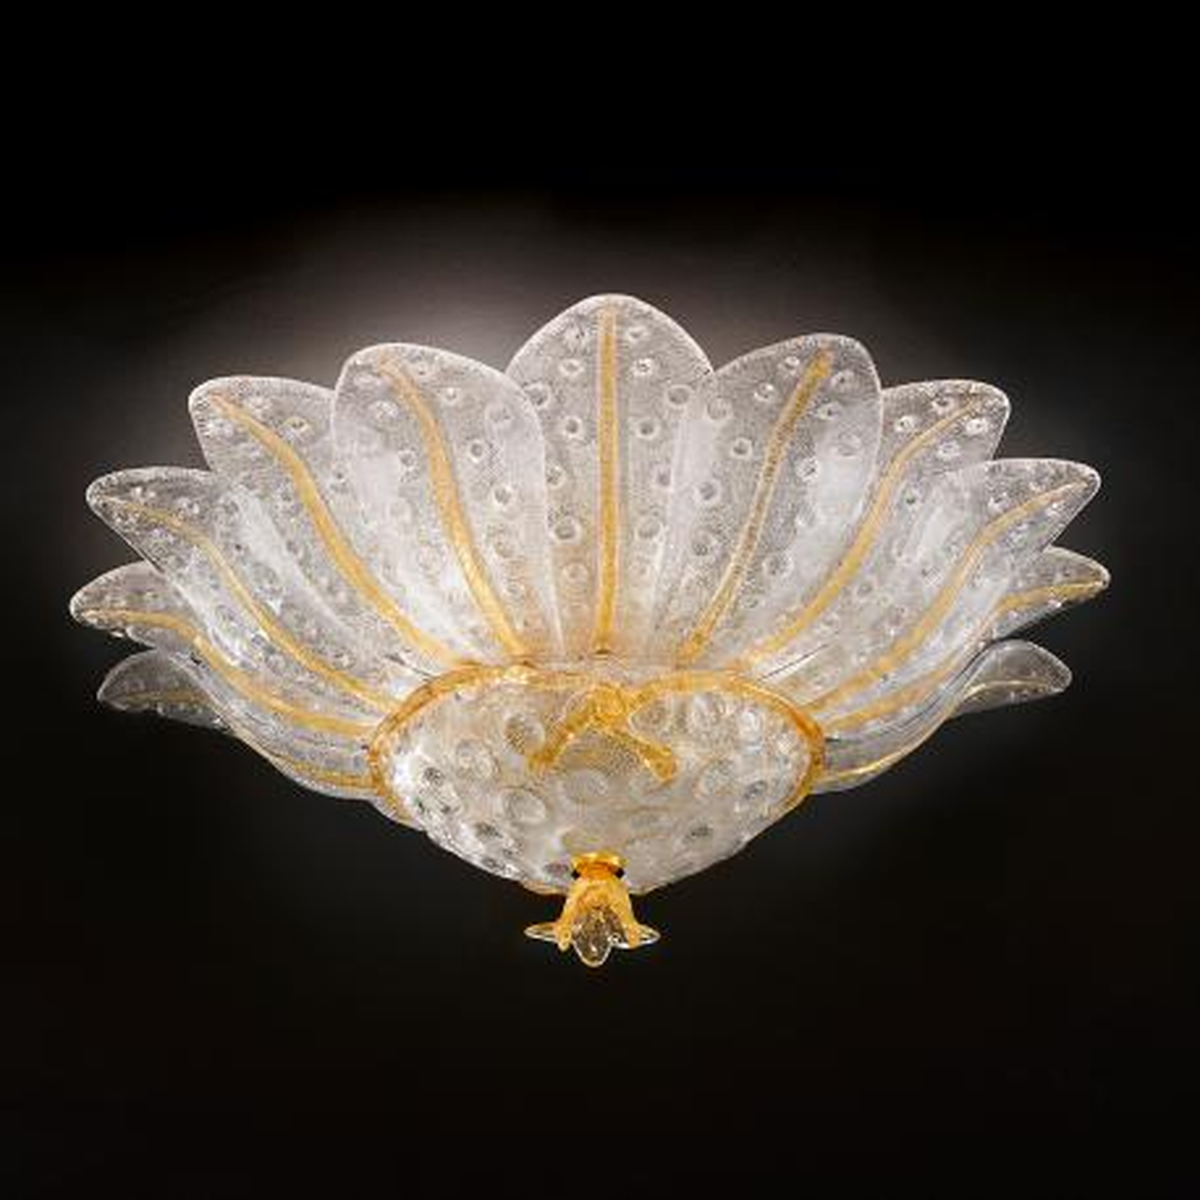 """Samanta"" plafonnier en verre de Murano - 6 lumières - transparent et ambre"